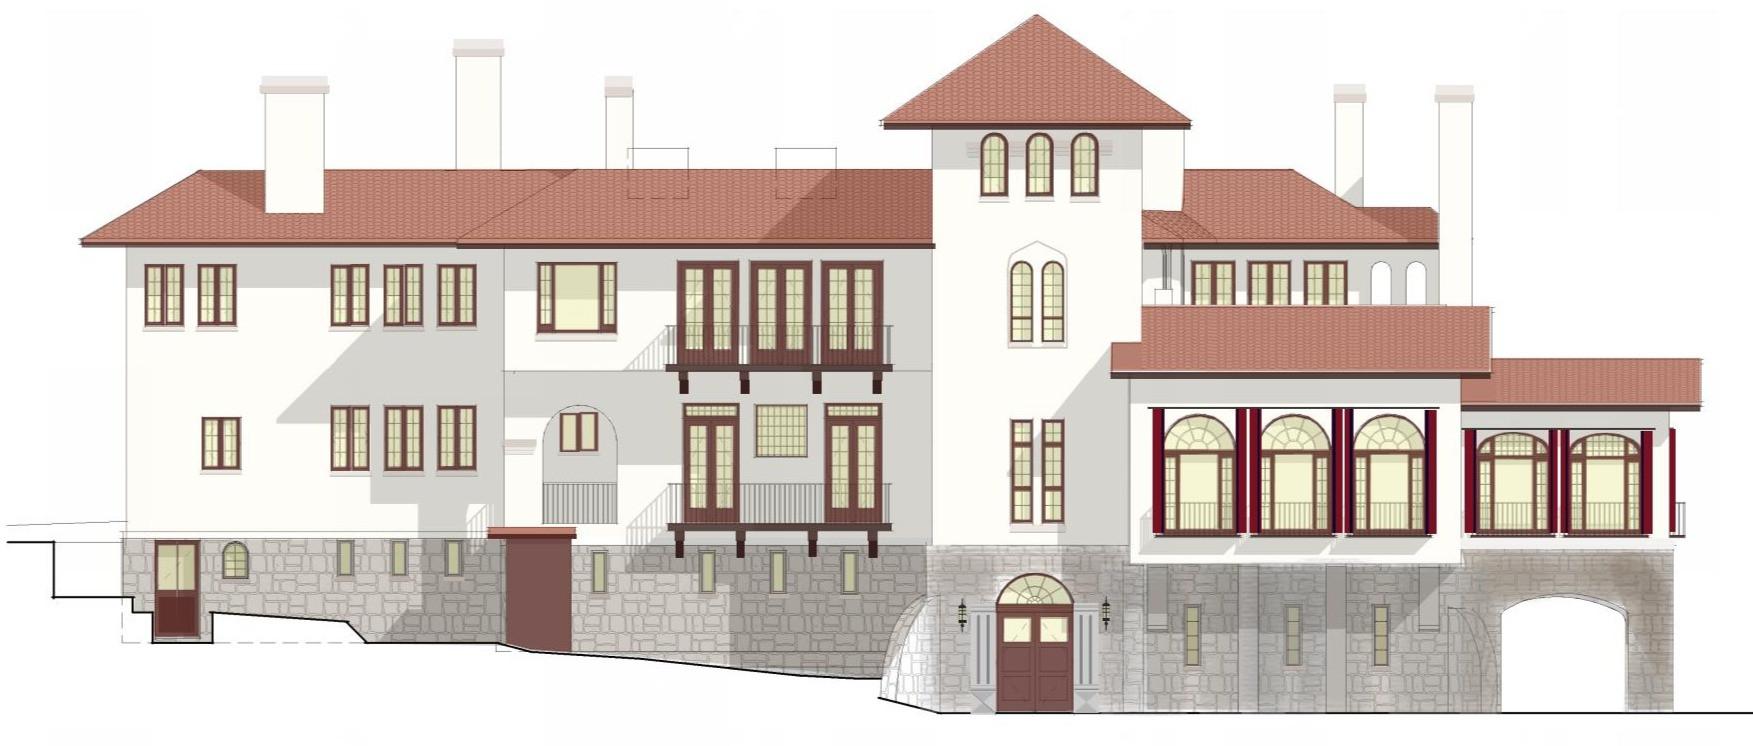 """La Atalaya"" Rehabilitation Concept"